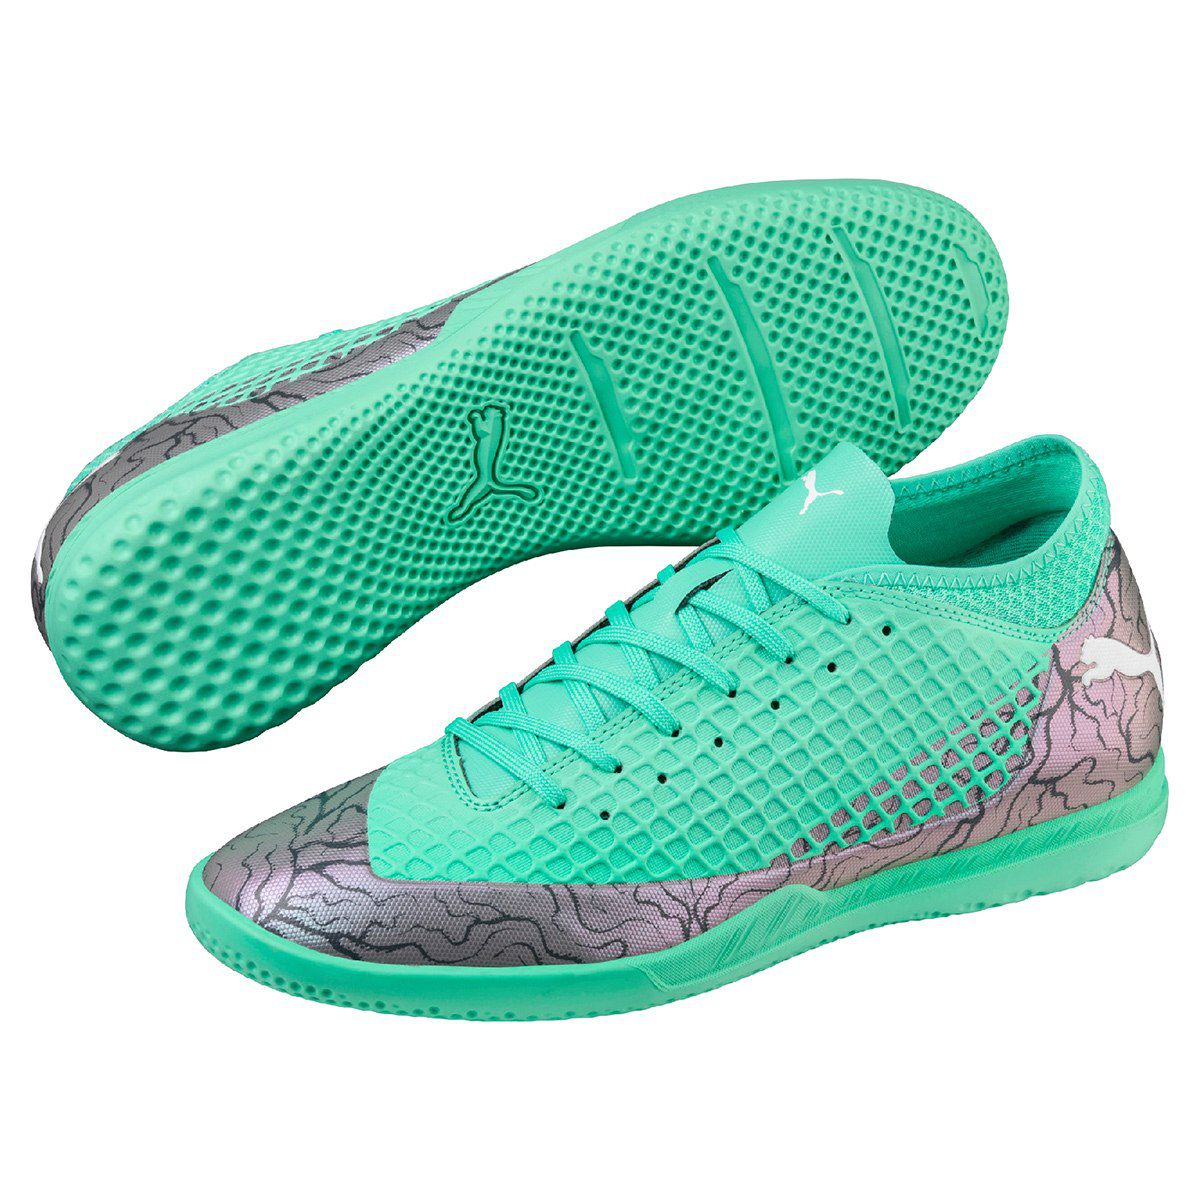 5a337a309f0a9 Chuteira Futsal Puma Future 2.4 IT Masculina - BRACIA SHOP  Loja de ...